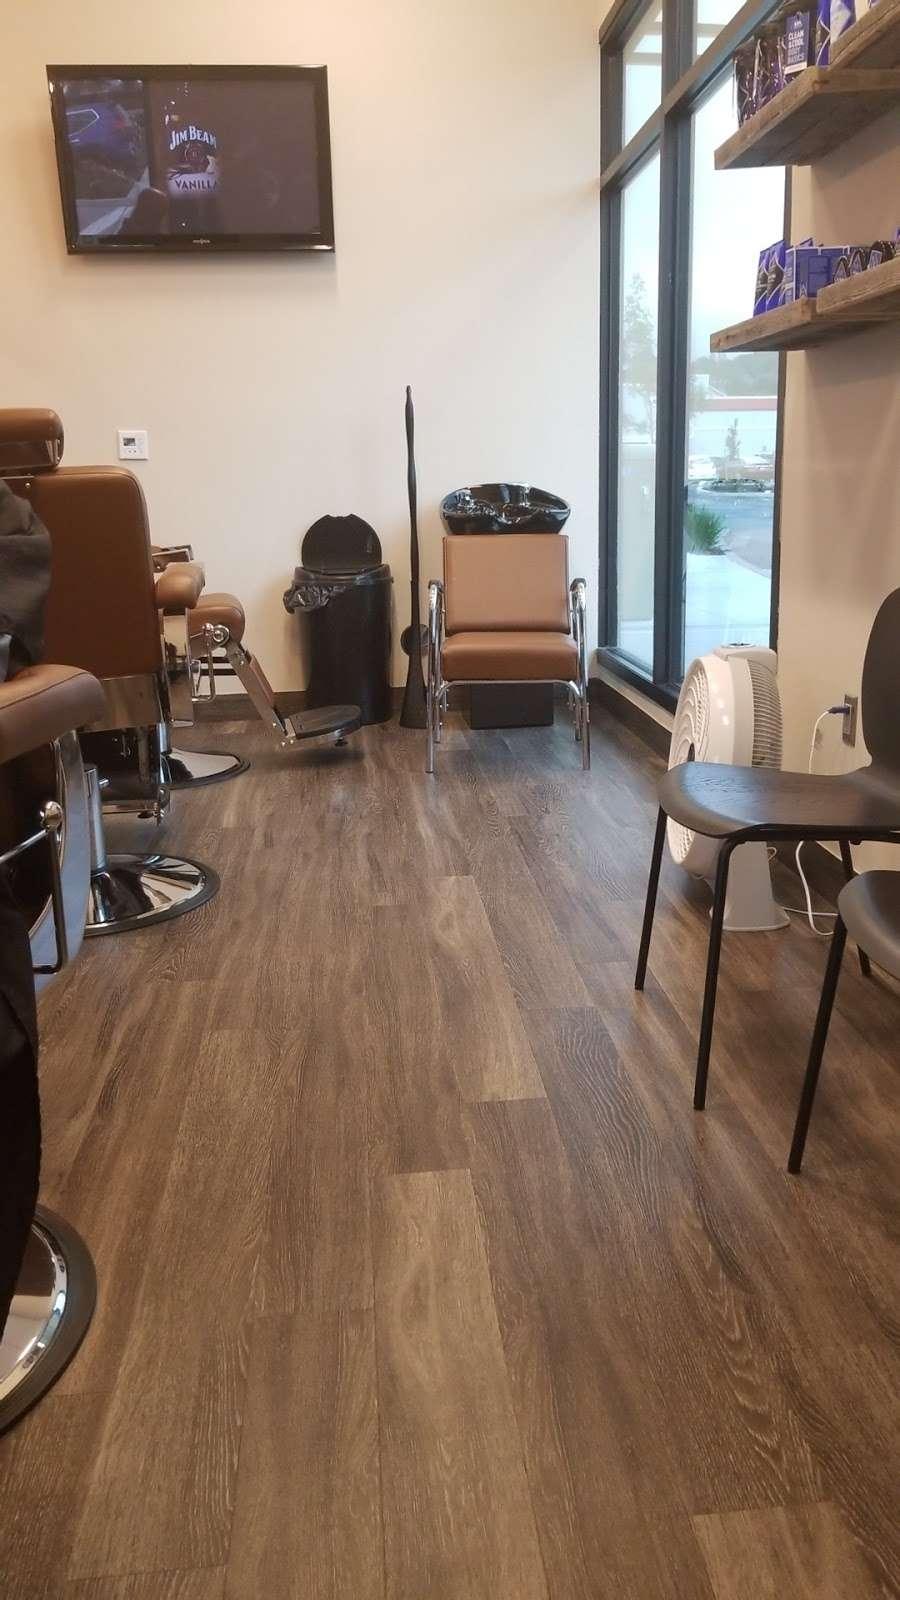 Jovance Salon & Barbering, 15 Pinole Valley Rd, Pinole, CA 15 ...